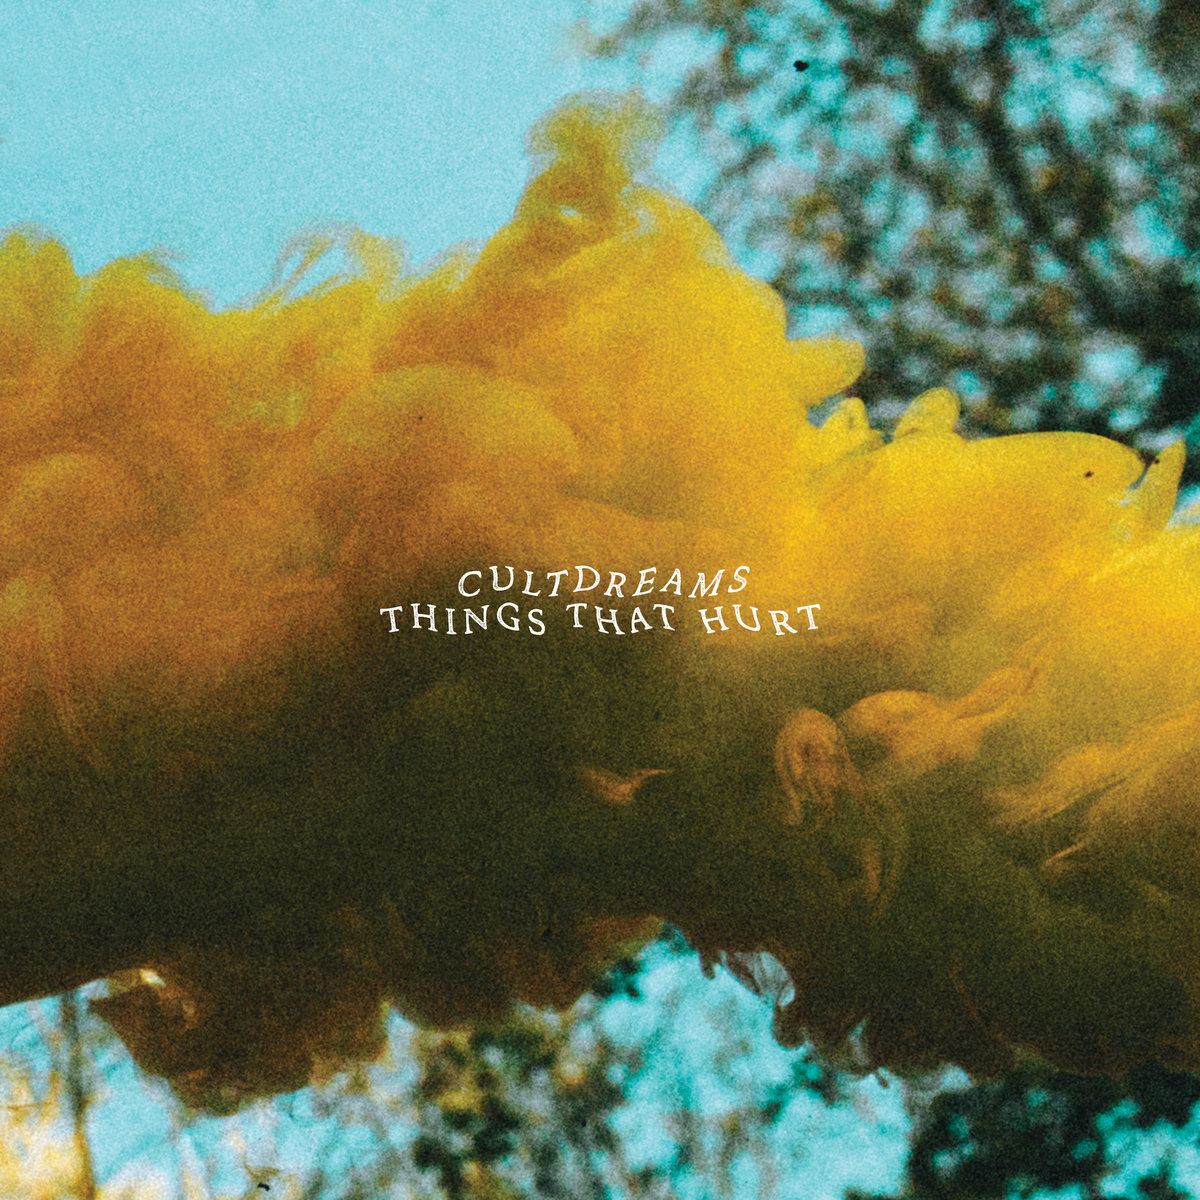 Cultdreams - Things That Hurt LP